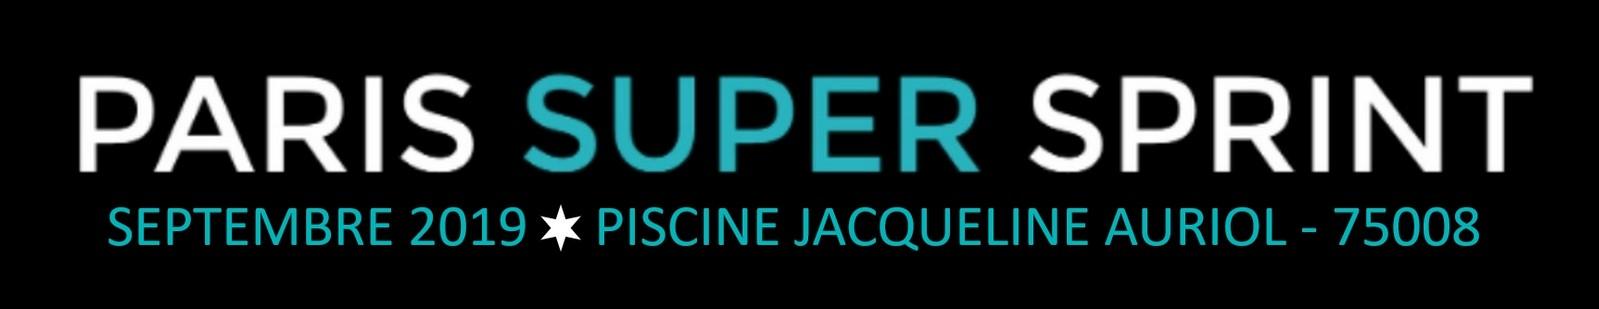 supersprint-75008-logo-recadr